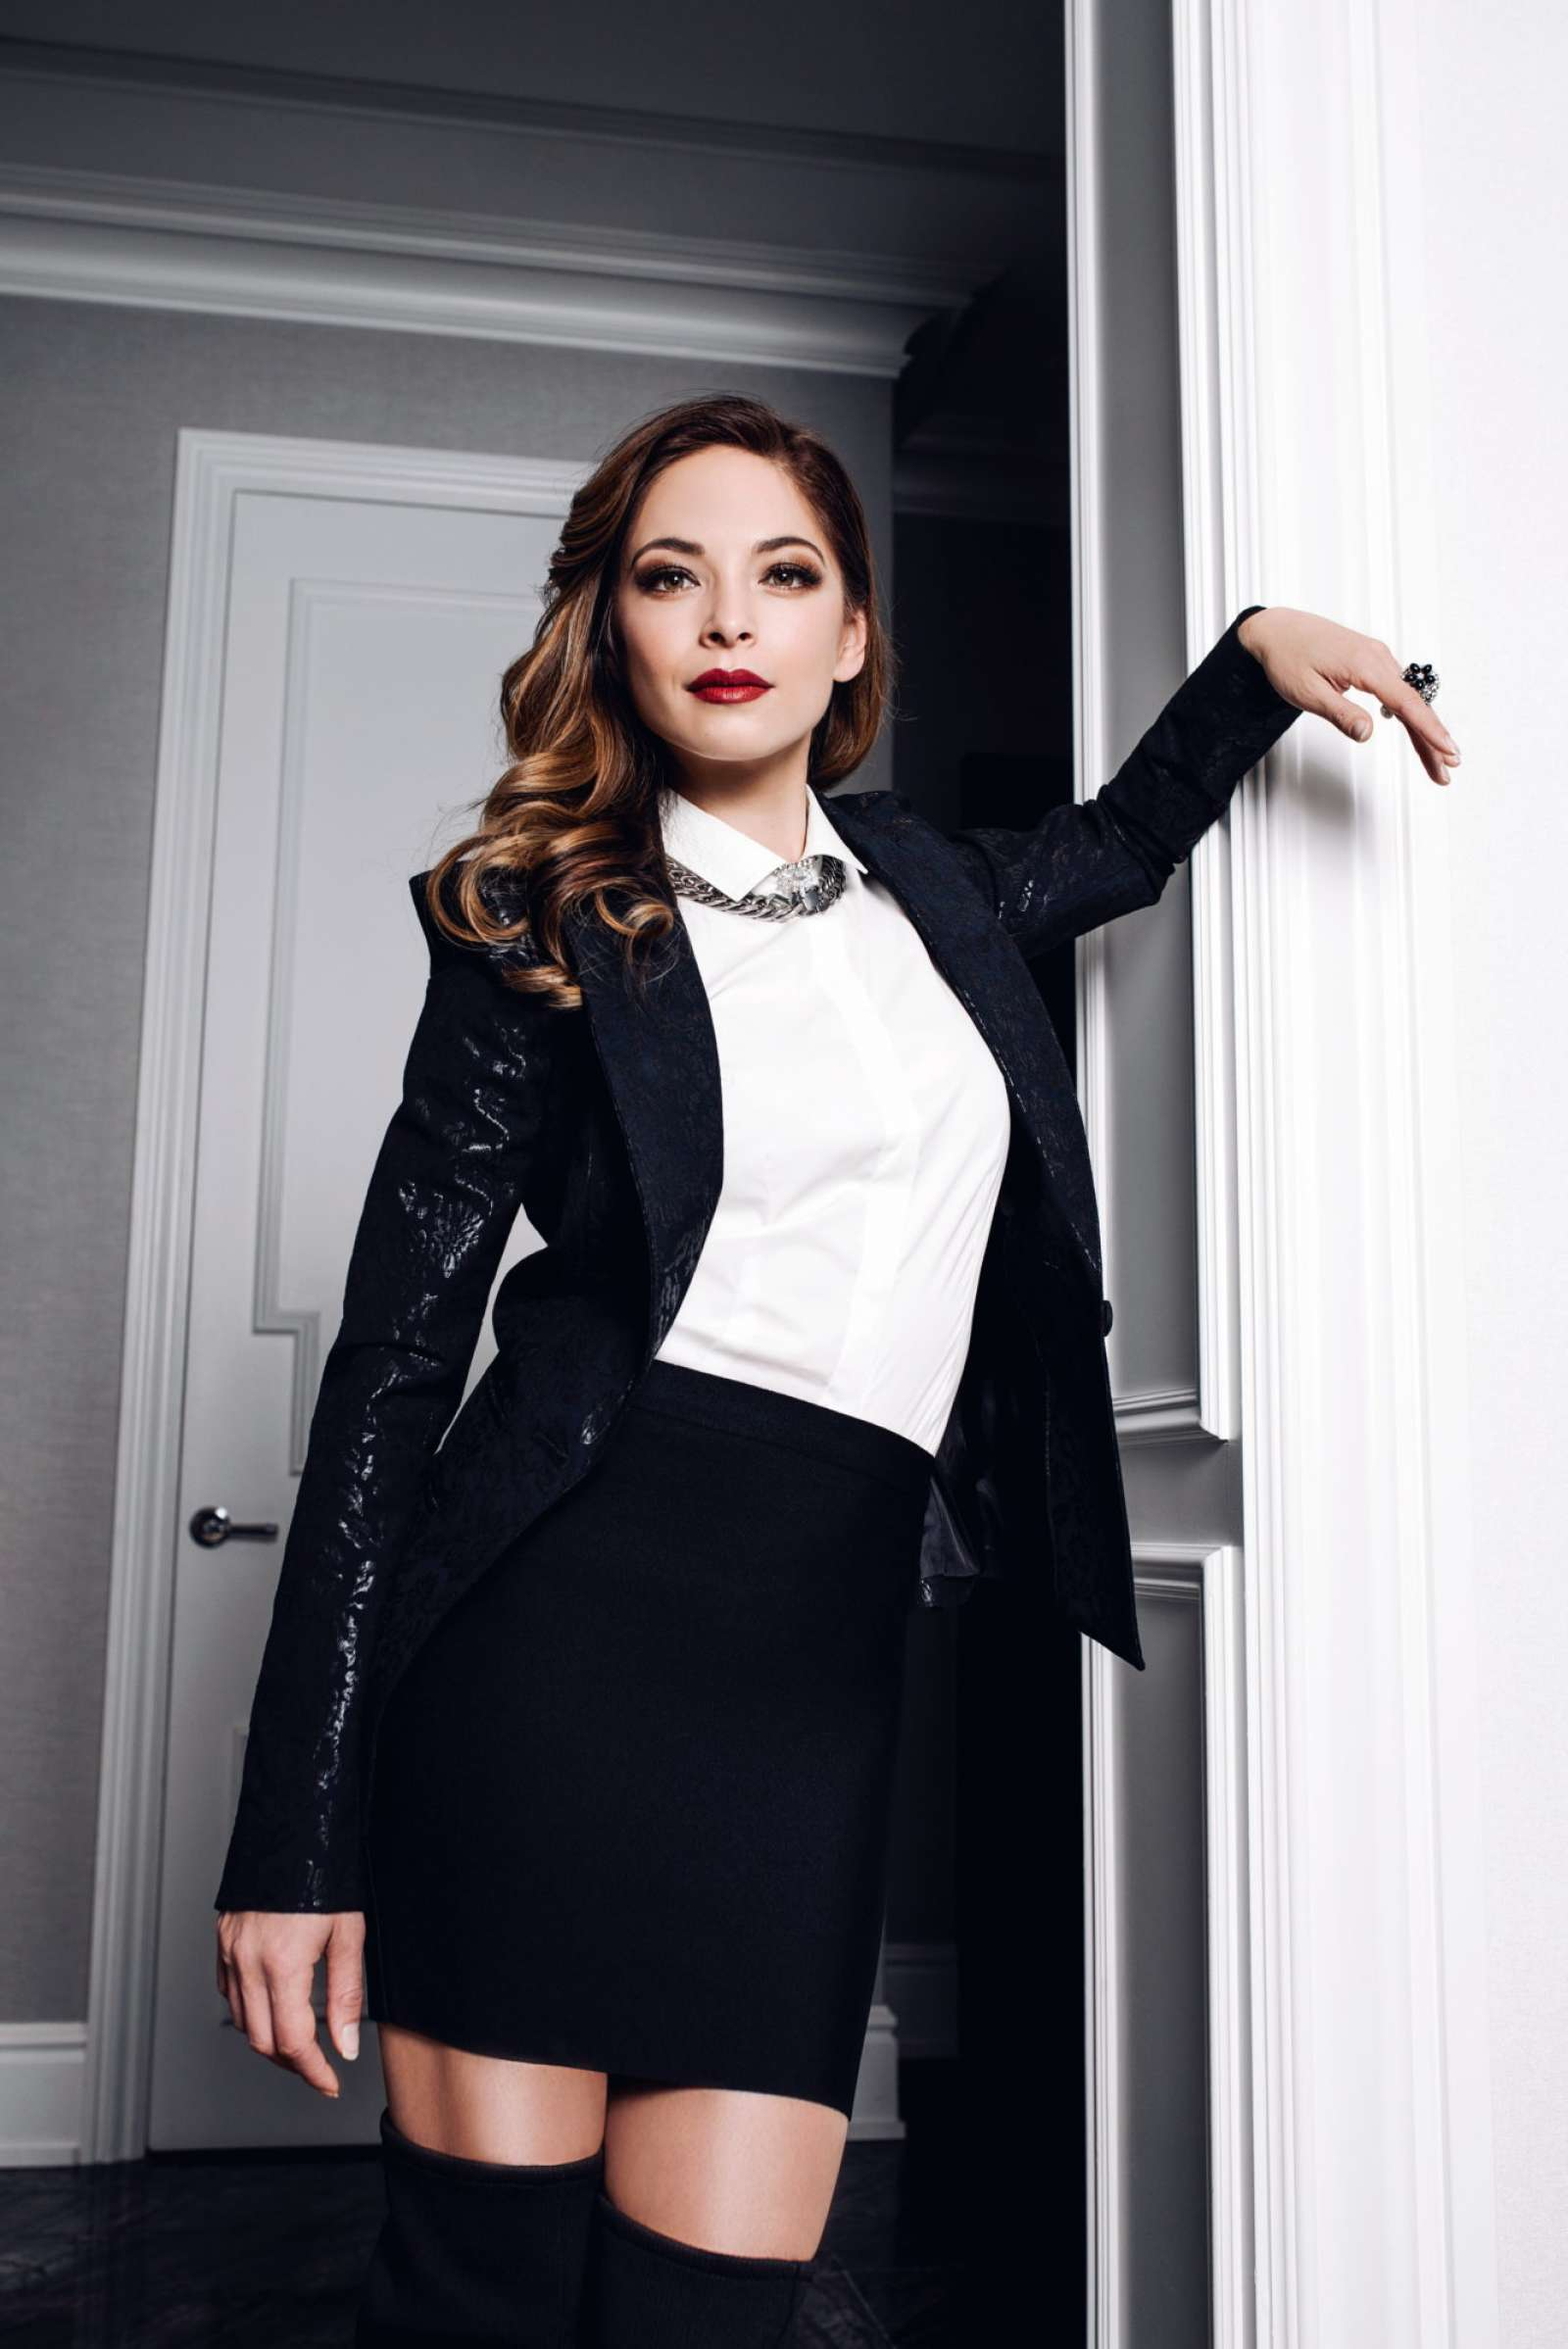 Kristin Kreuk - Beyond Fashion Magazine (Canada Issue - January 2019)